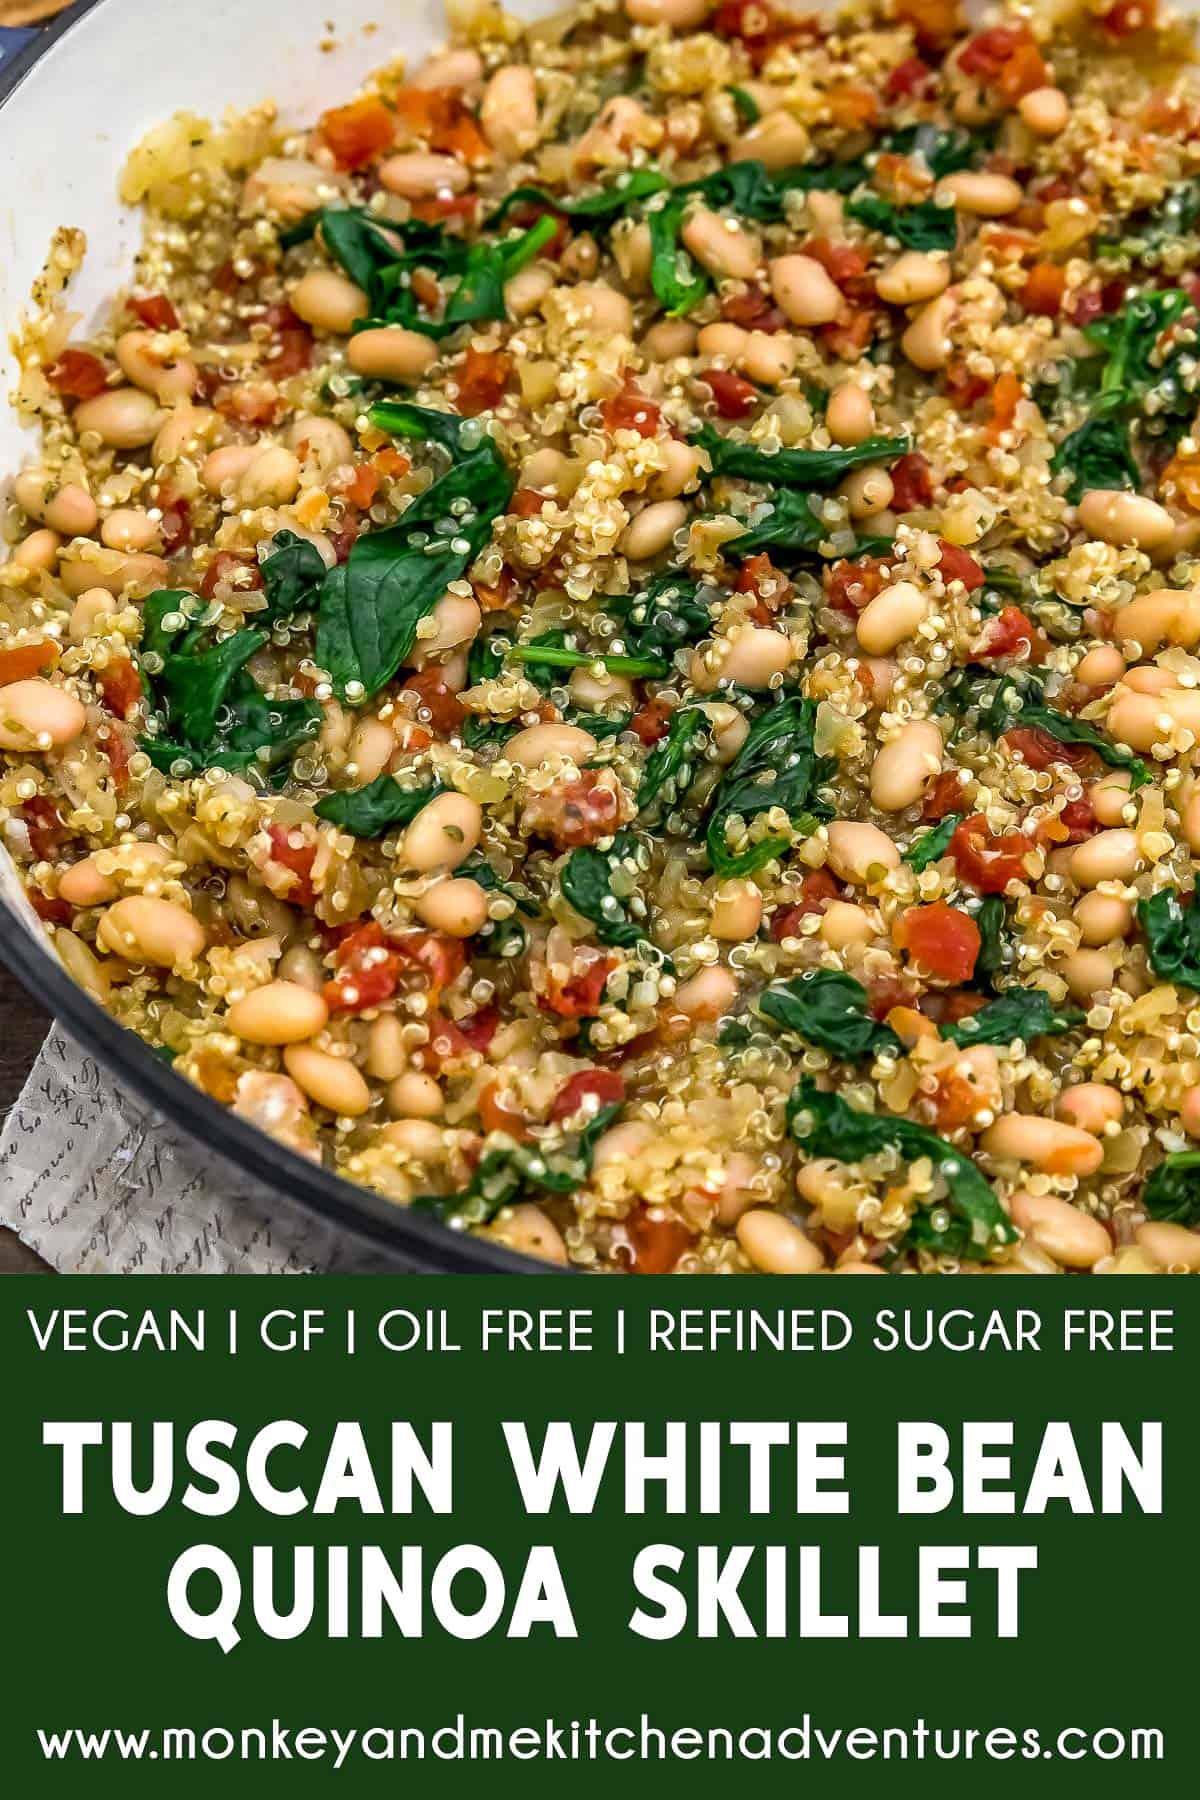 Tuscan White Bean Quinoa Skillet with text description